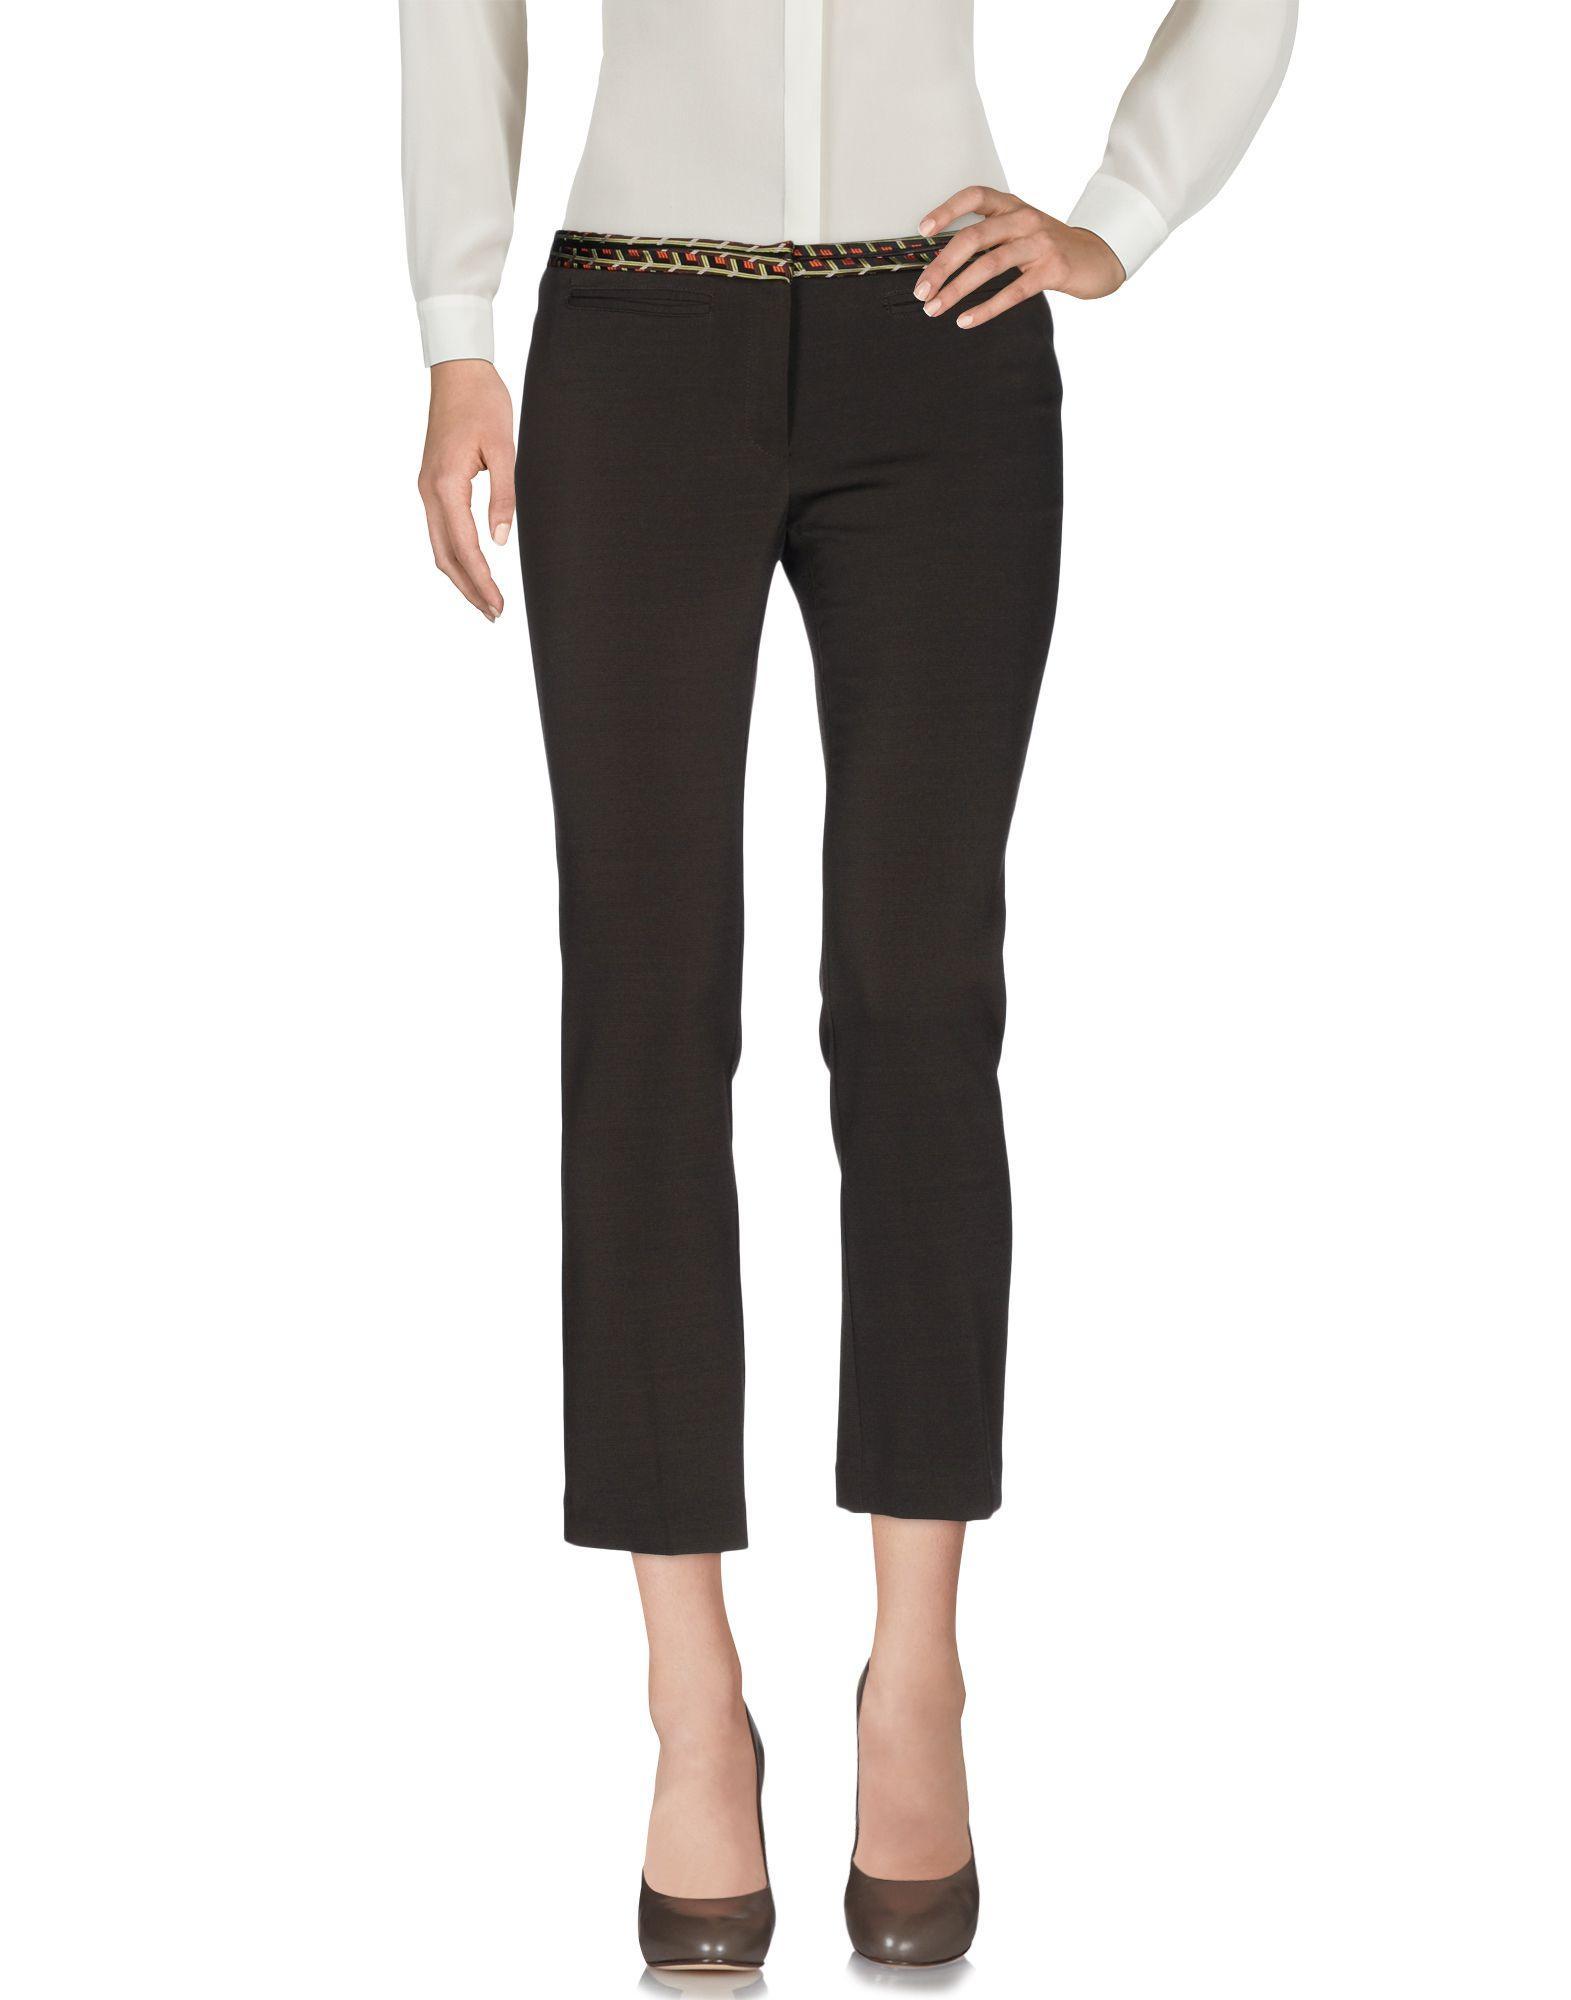 Teresa Dainelli Casual Pants In Dark Brown